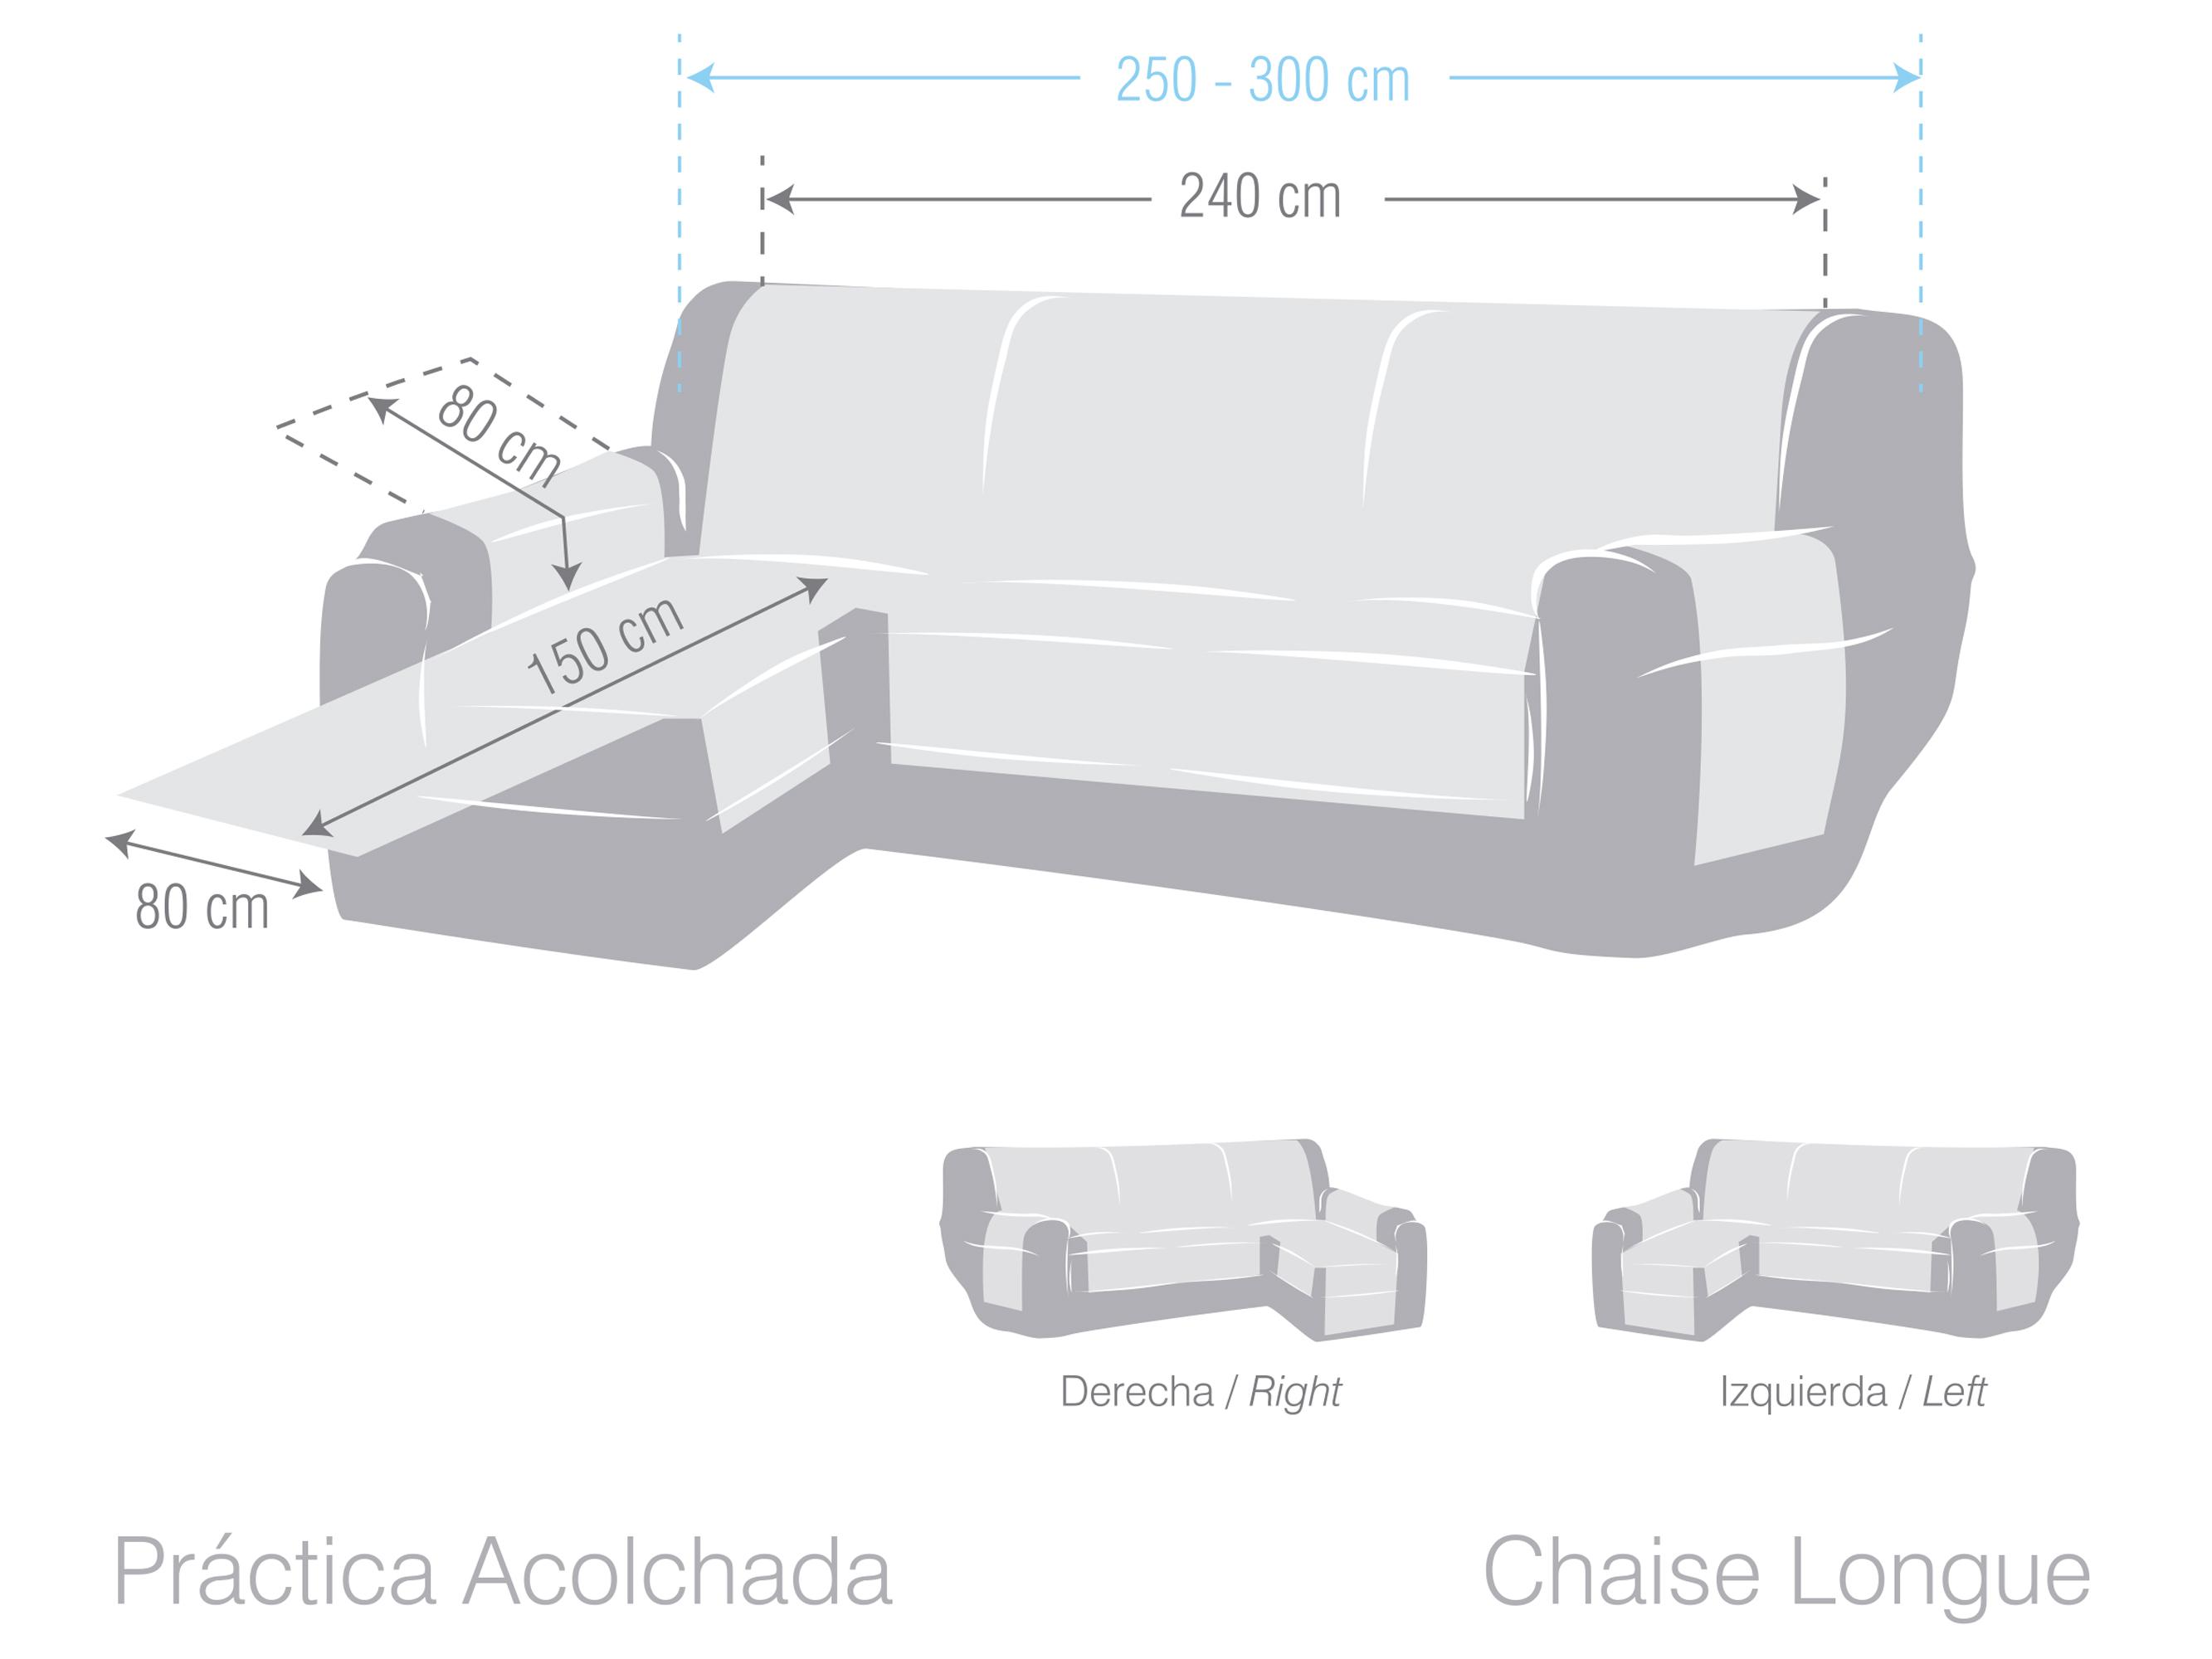 F_PRACTICA-ACOLCHADA-CHL--NORMAL.jpg